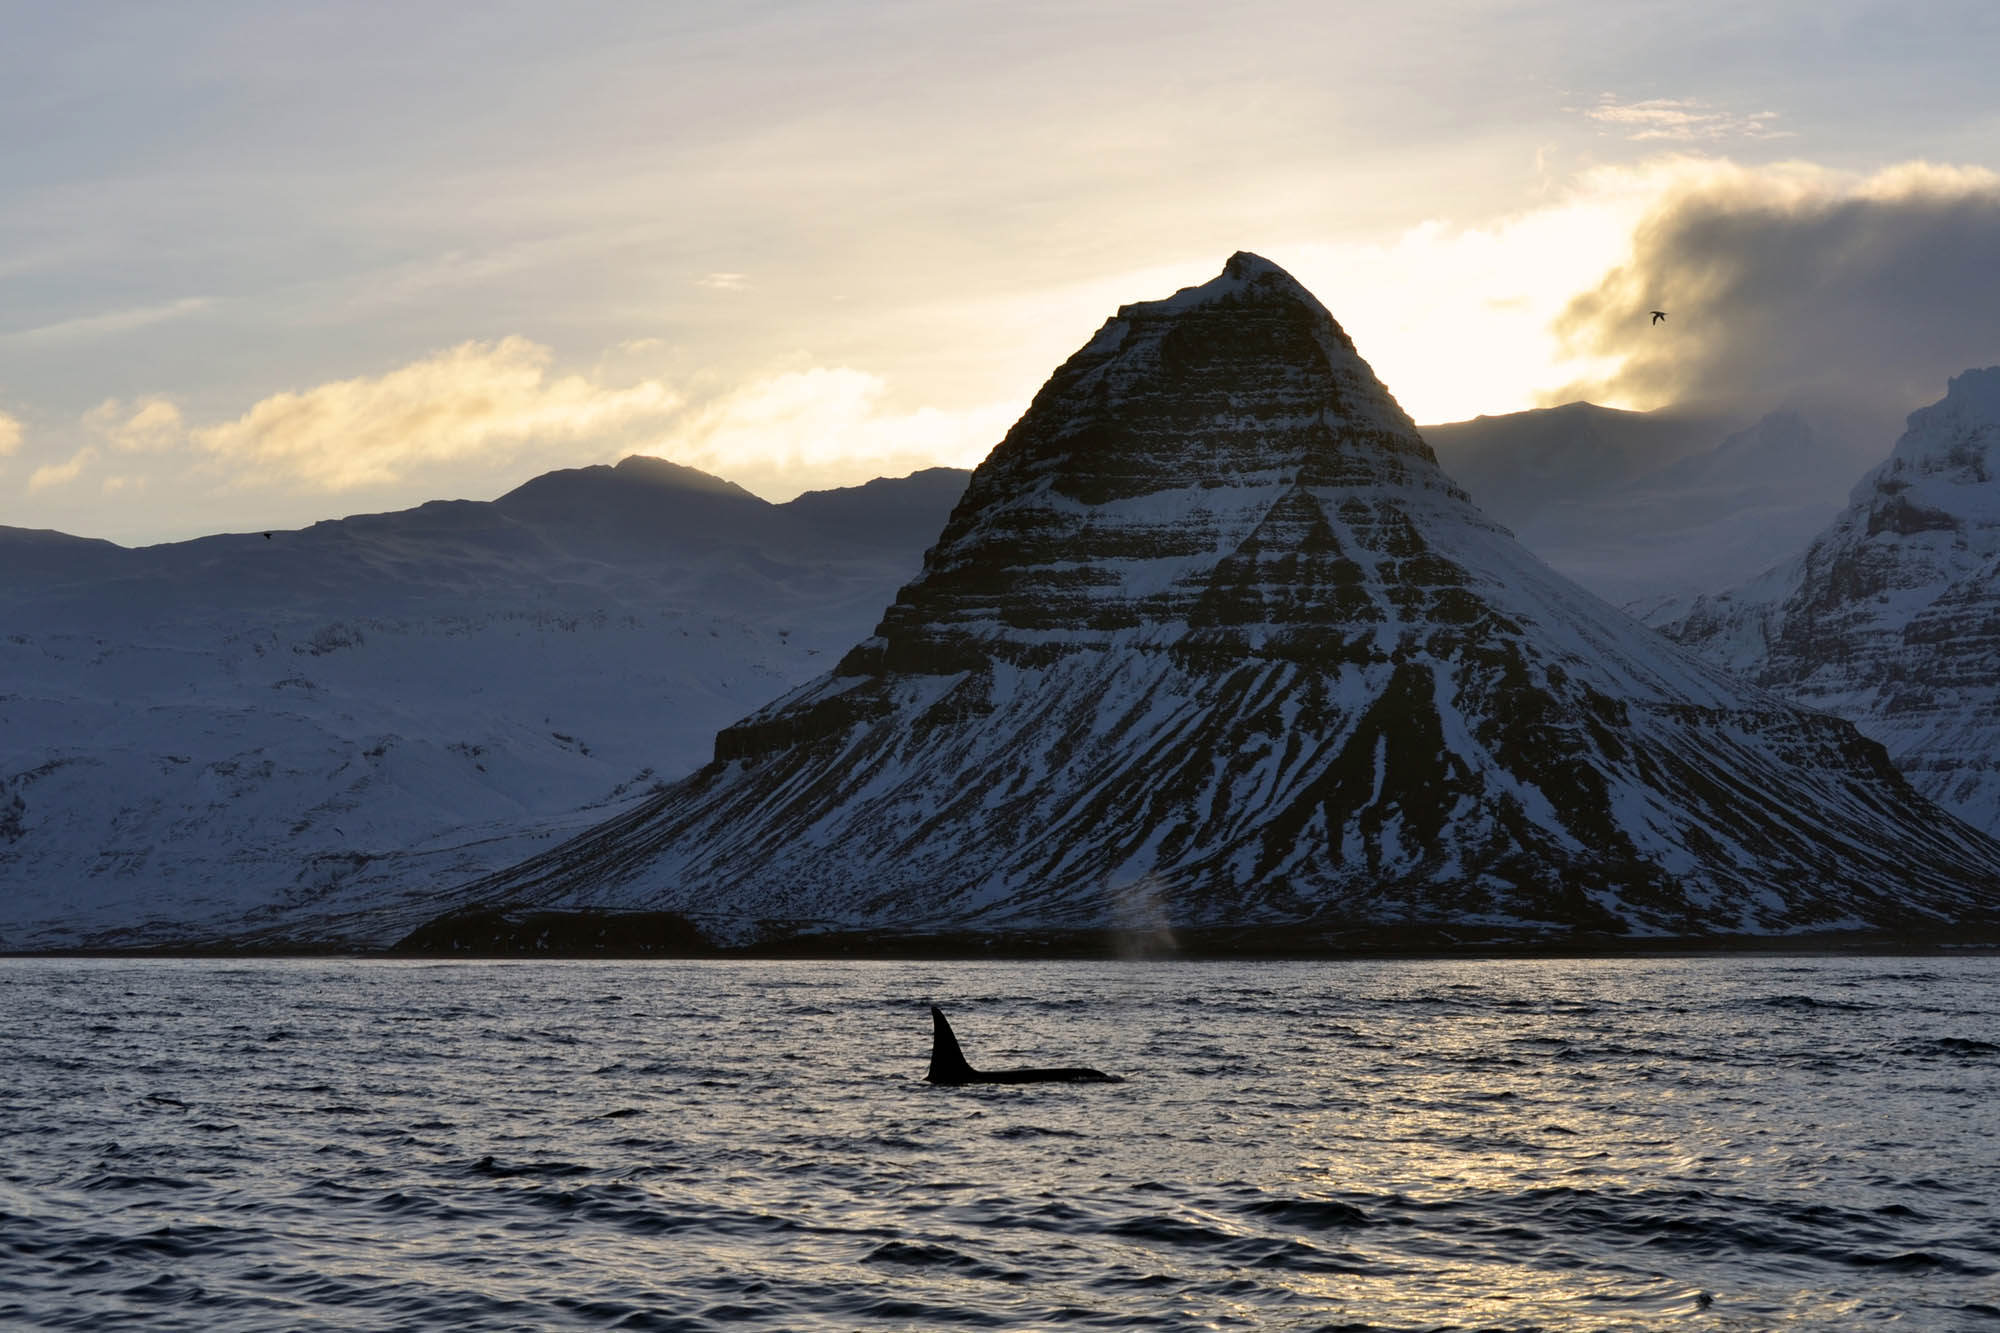 Orca watching Iceland - killer whale near Kirkjufell mountain